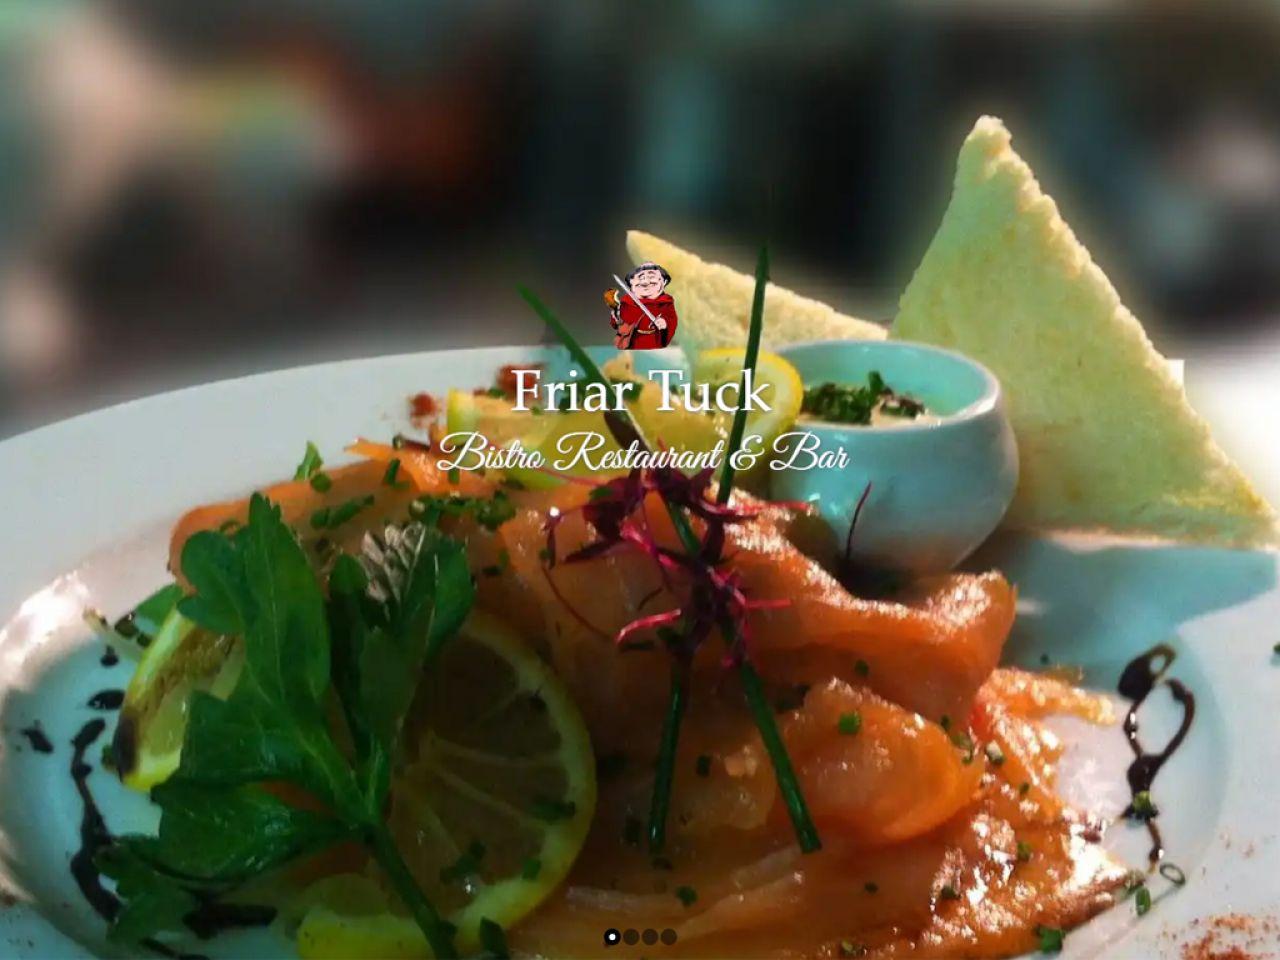 Friar Tuck Bistro Restaurant & Bar